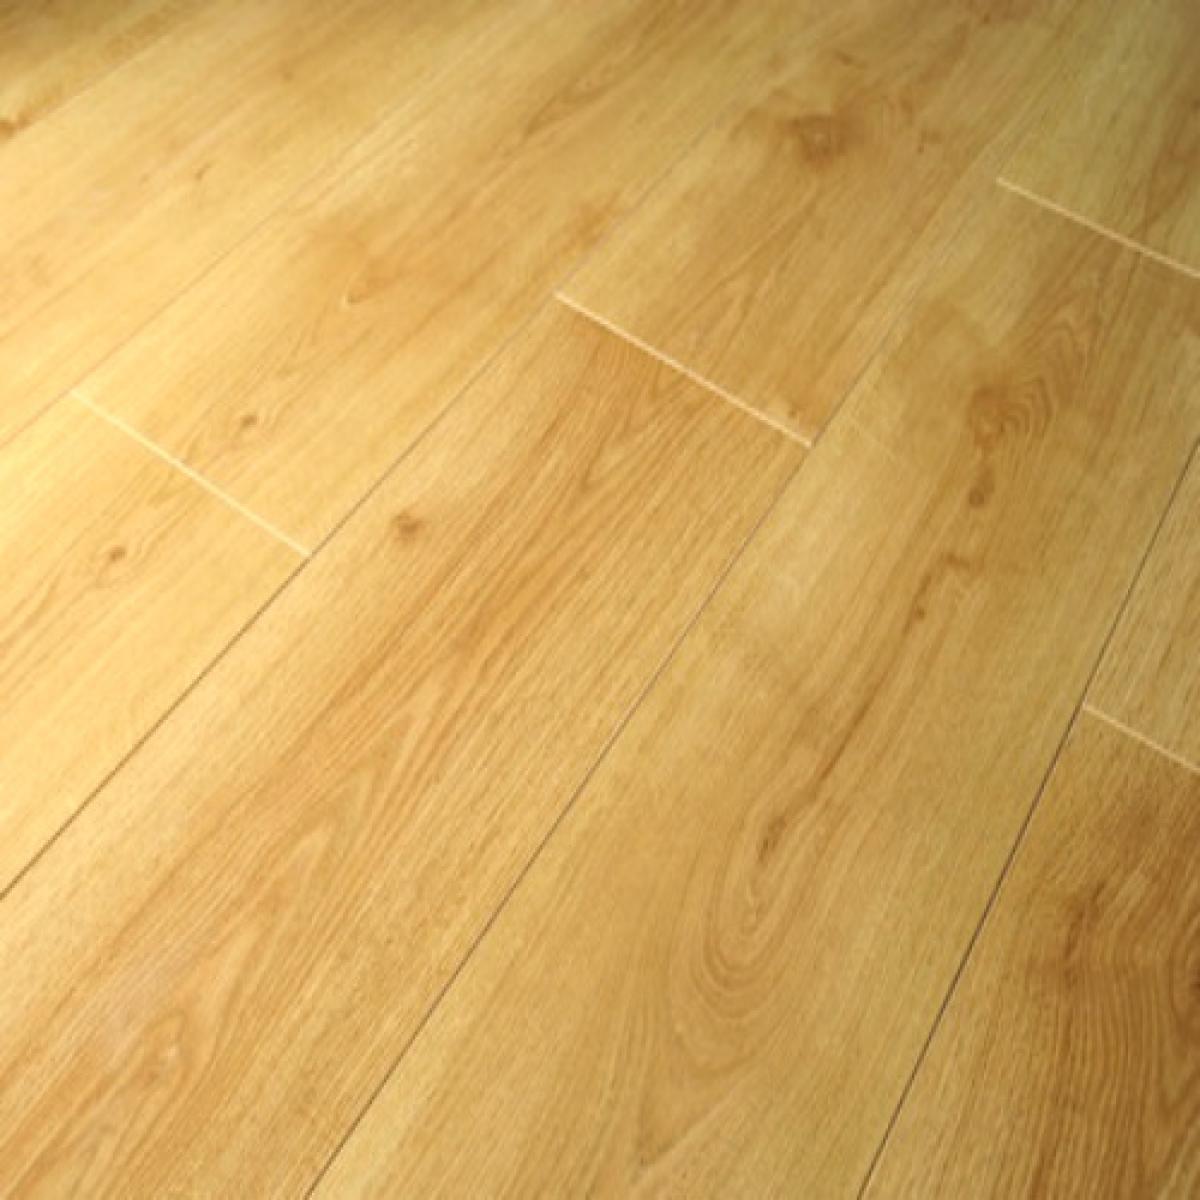 Prestige Oak Planked Honey V Groove, Prestige Laminate Flooring Reviews